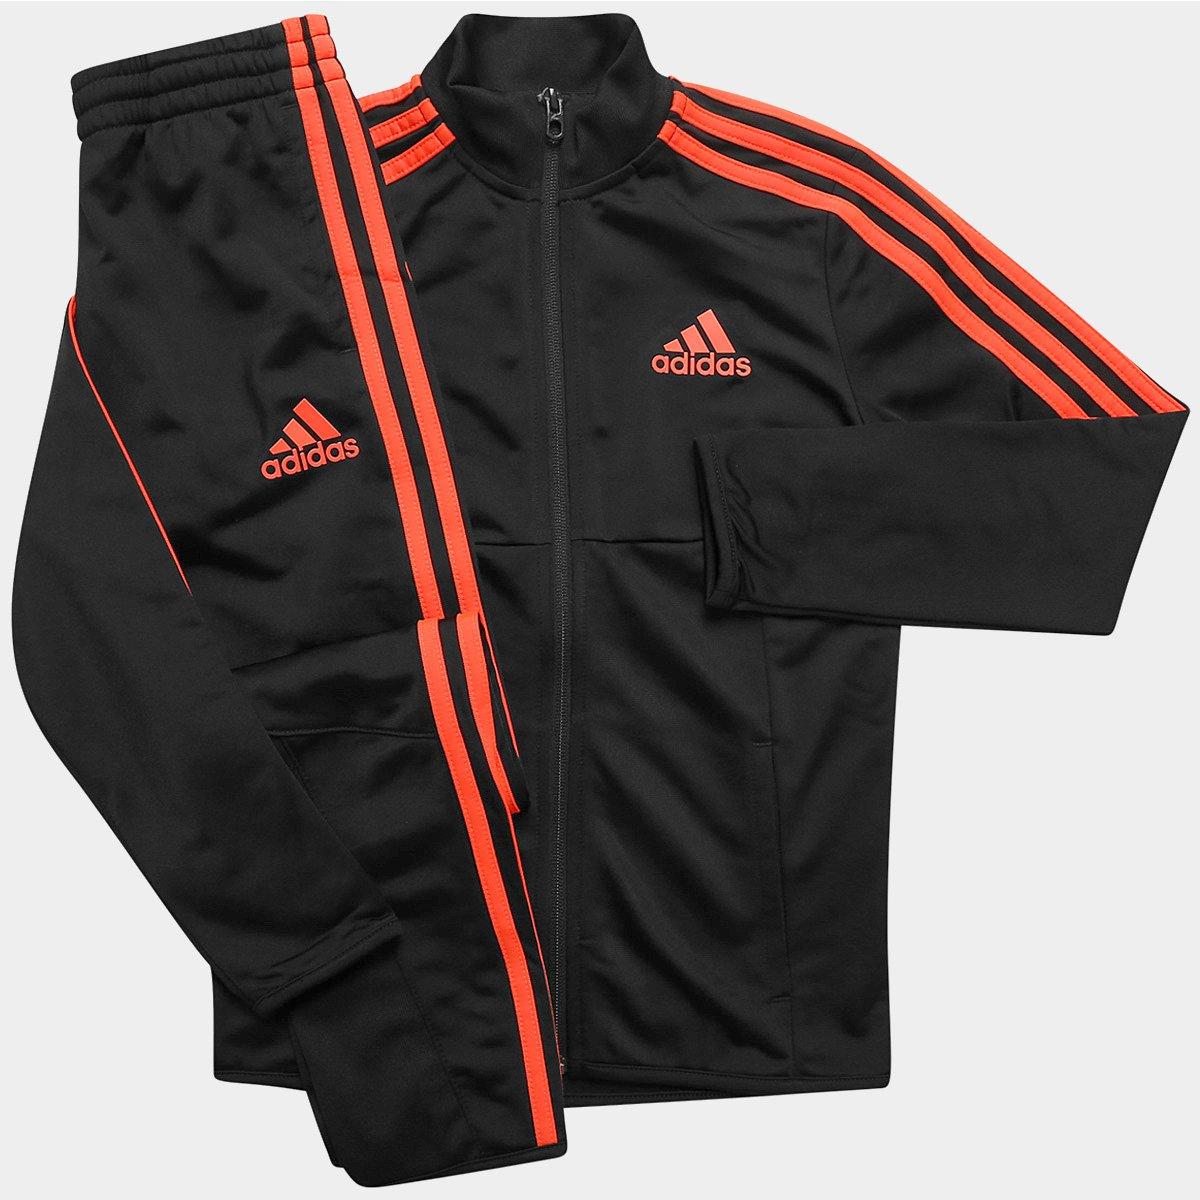 caed047c6c4f1 Agasalho Adidas YB TS Tiro KN Infantil - Compre Agora